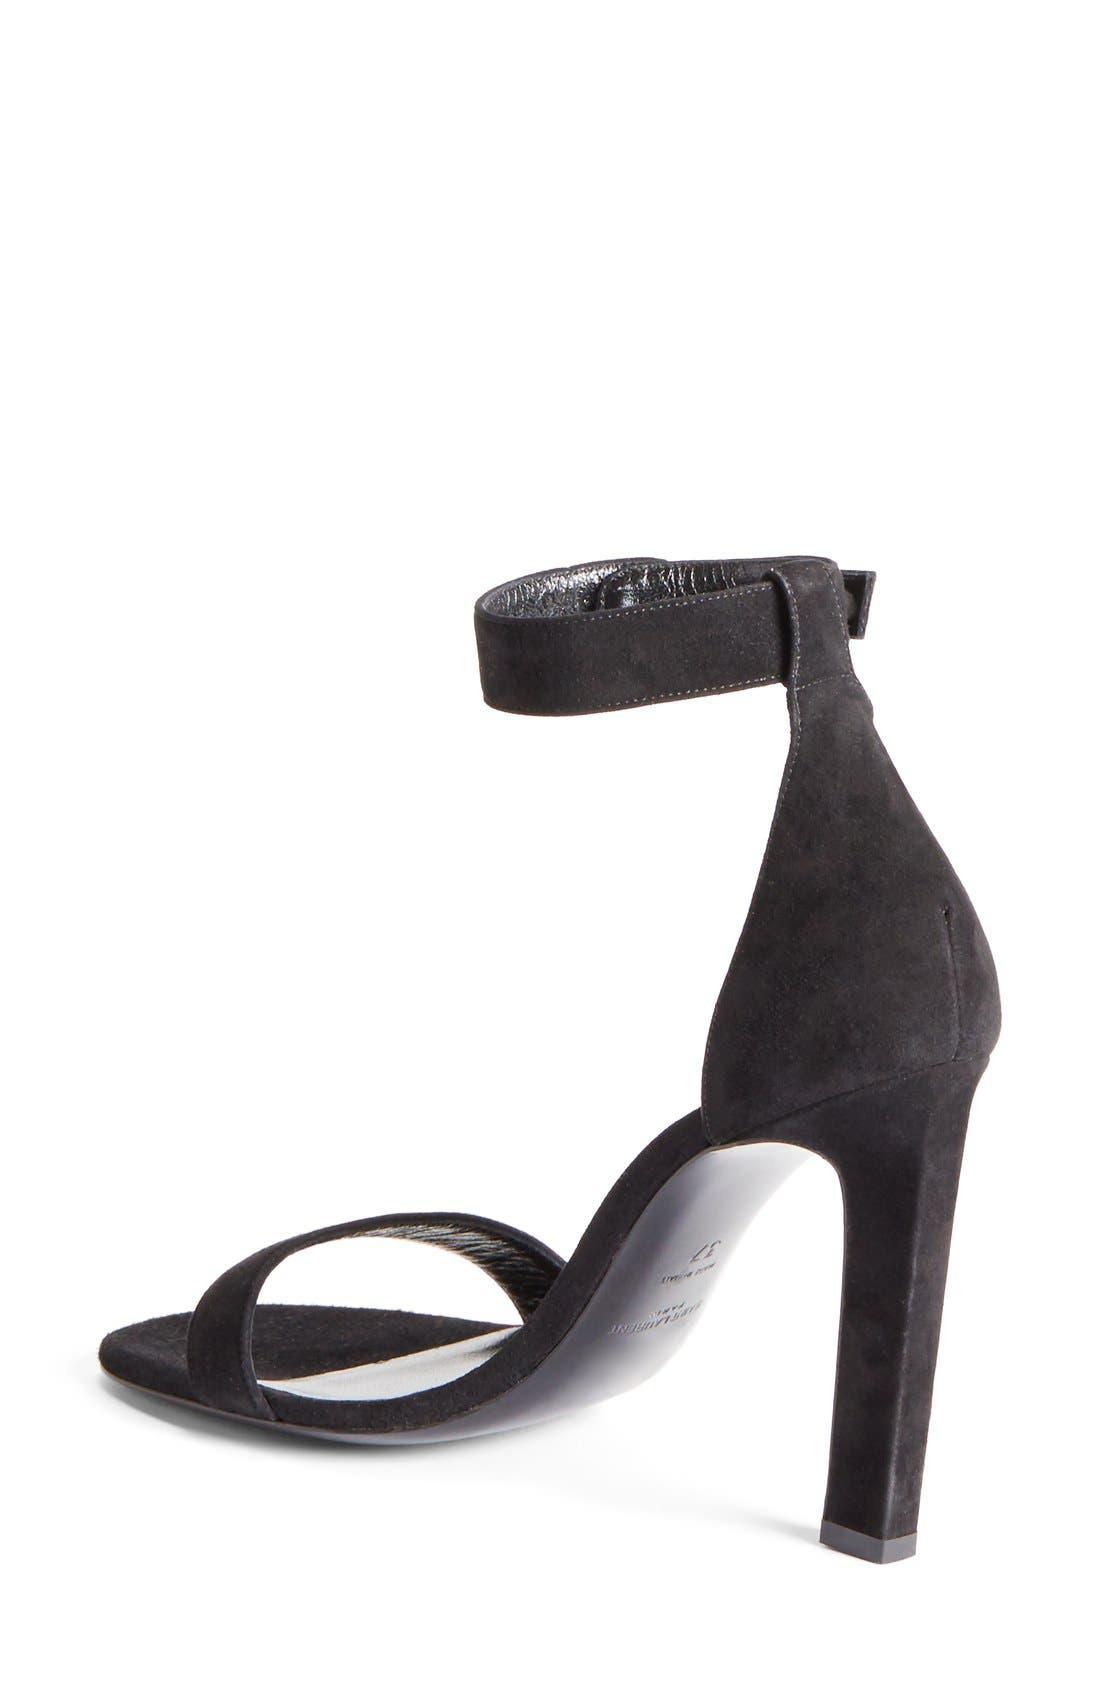 Alternate Image 2  - Saint Laurent 'Grace' Ankle Strap Sandal (Women)